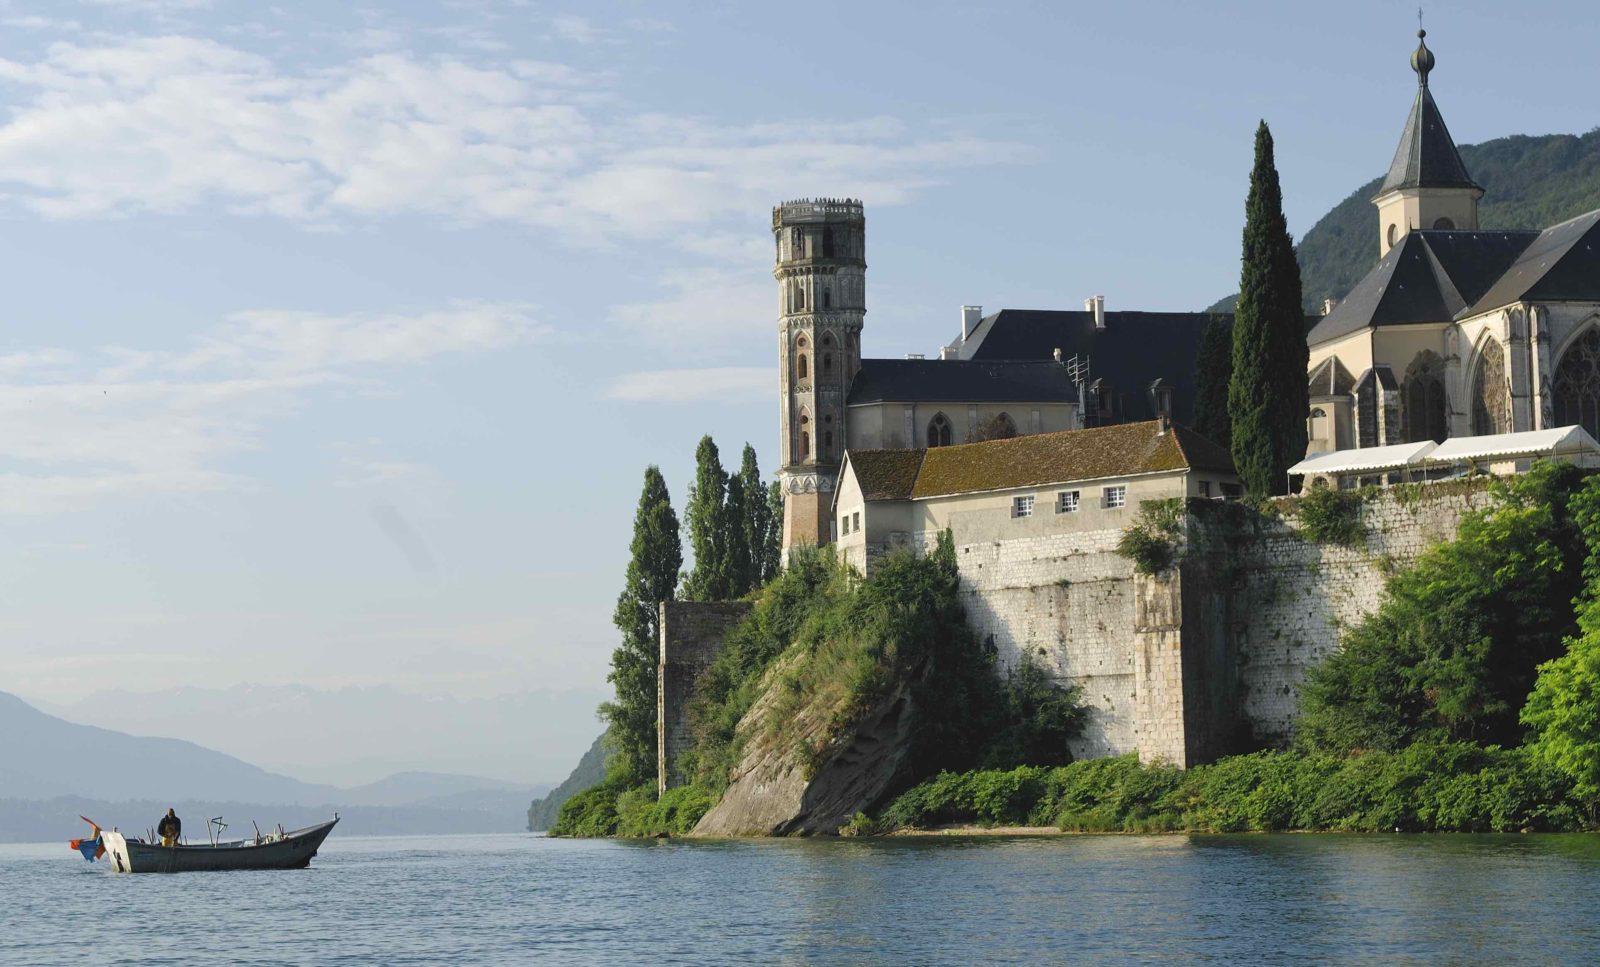 Abbaye d'Hautecombe barque sur le lac